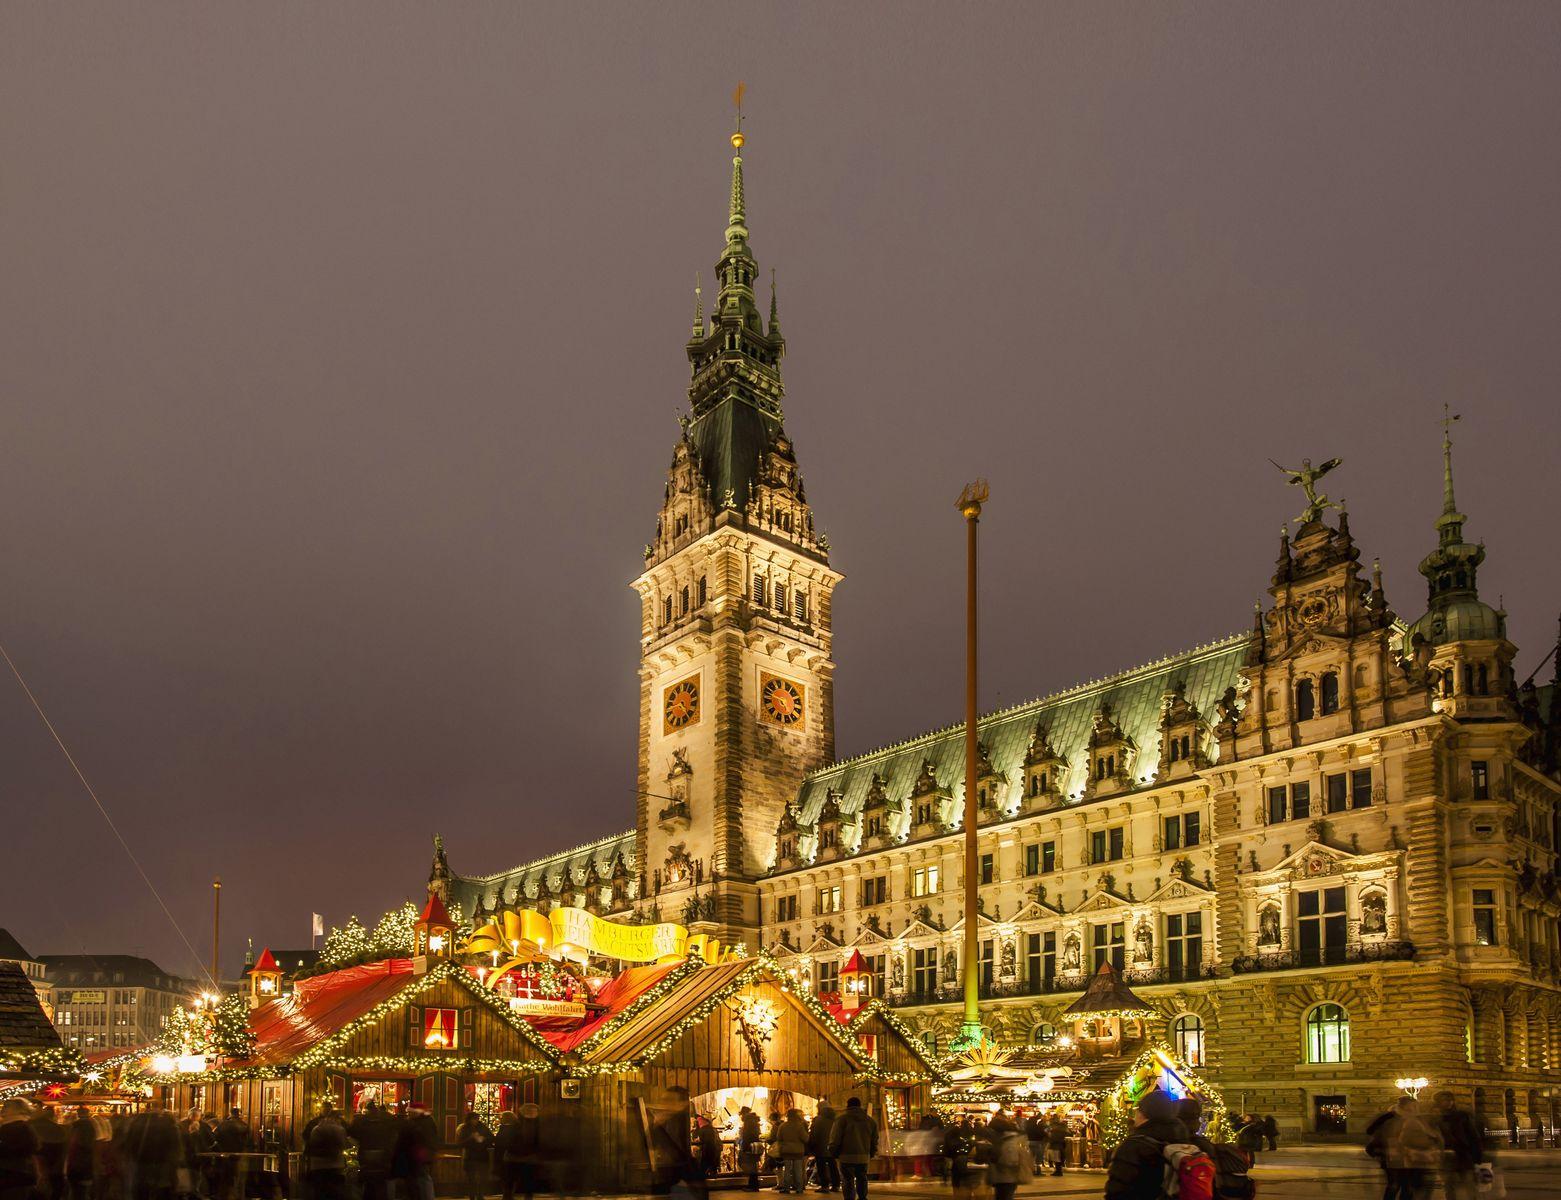 Обои дома, гамбург, германия, ночь, башня, кран. Города foto 18